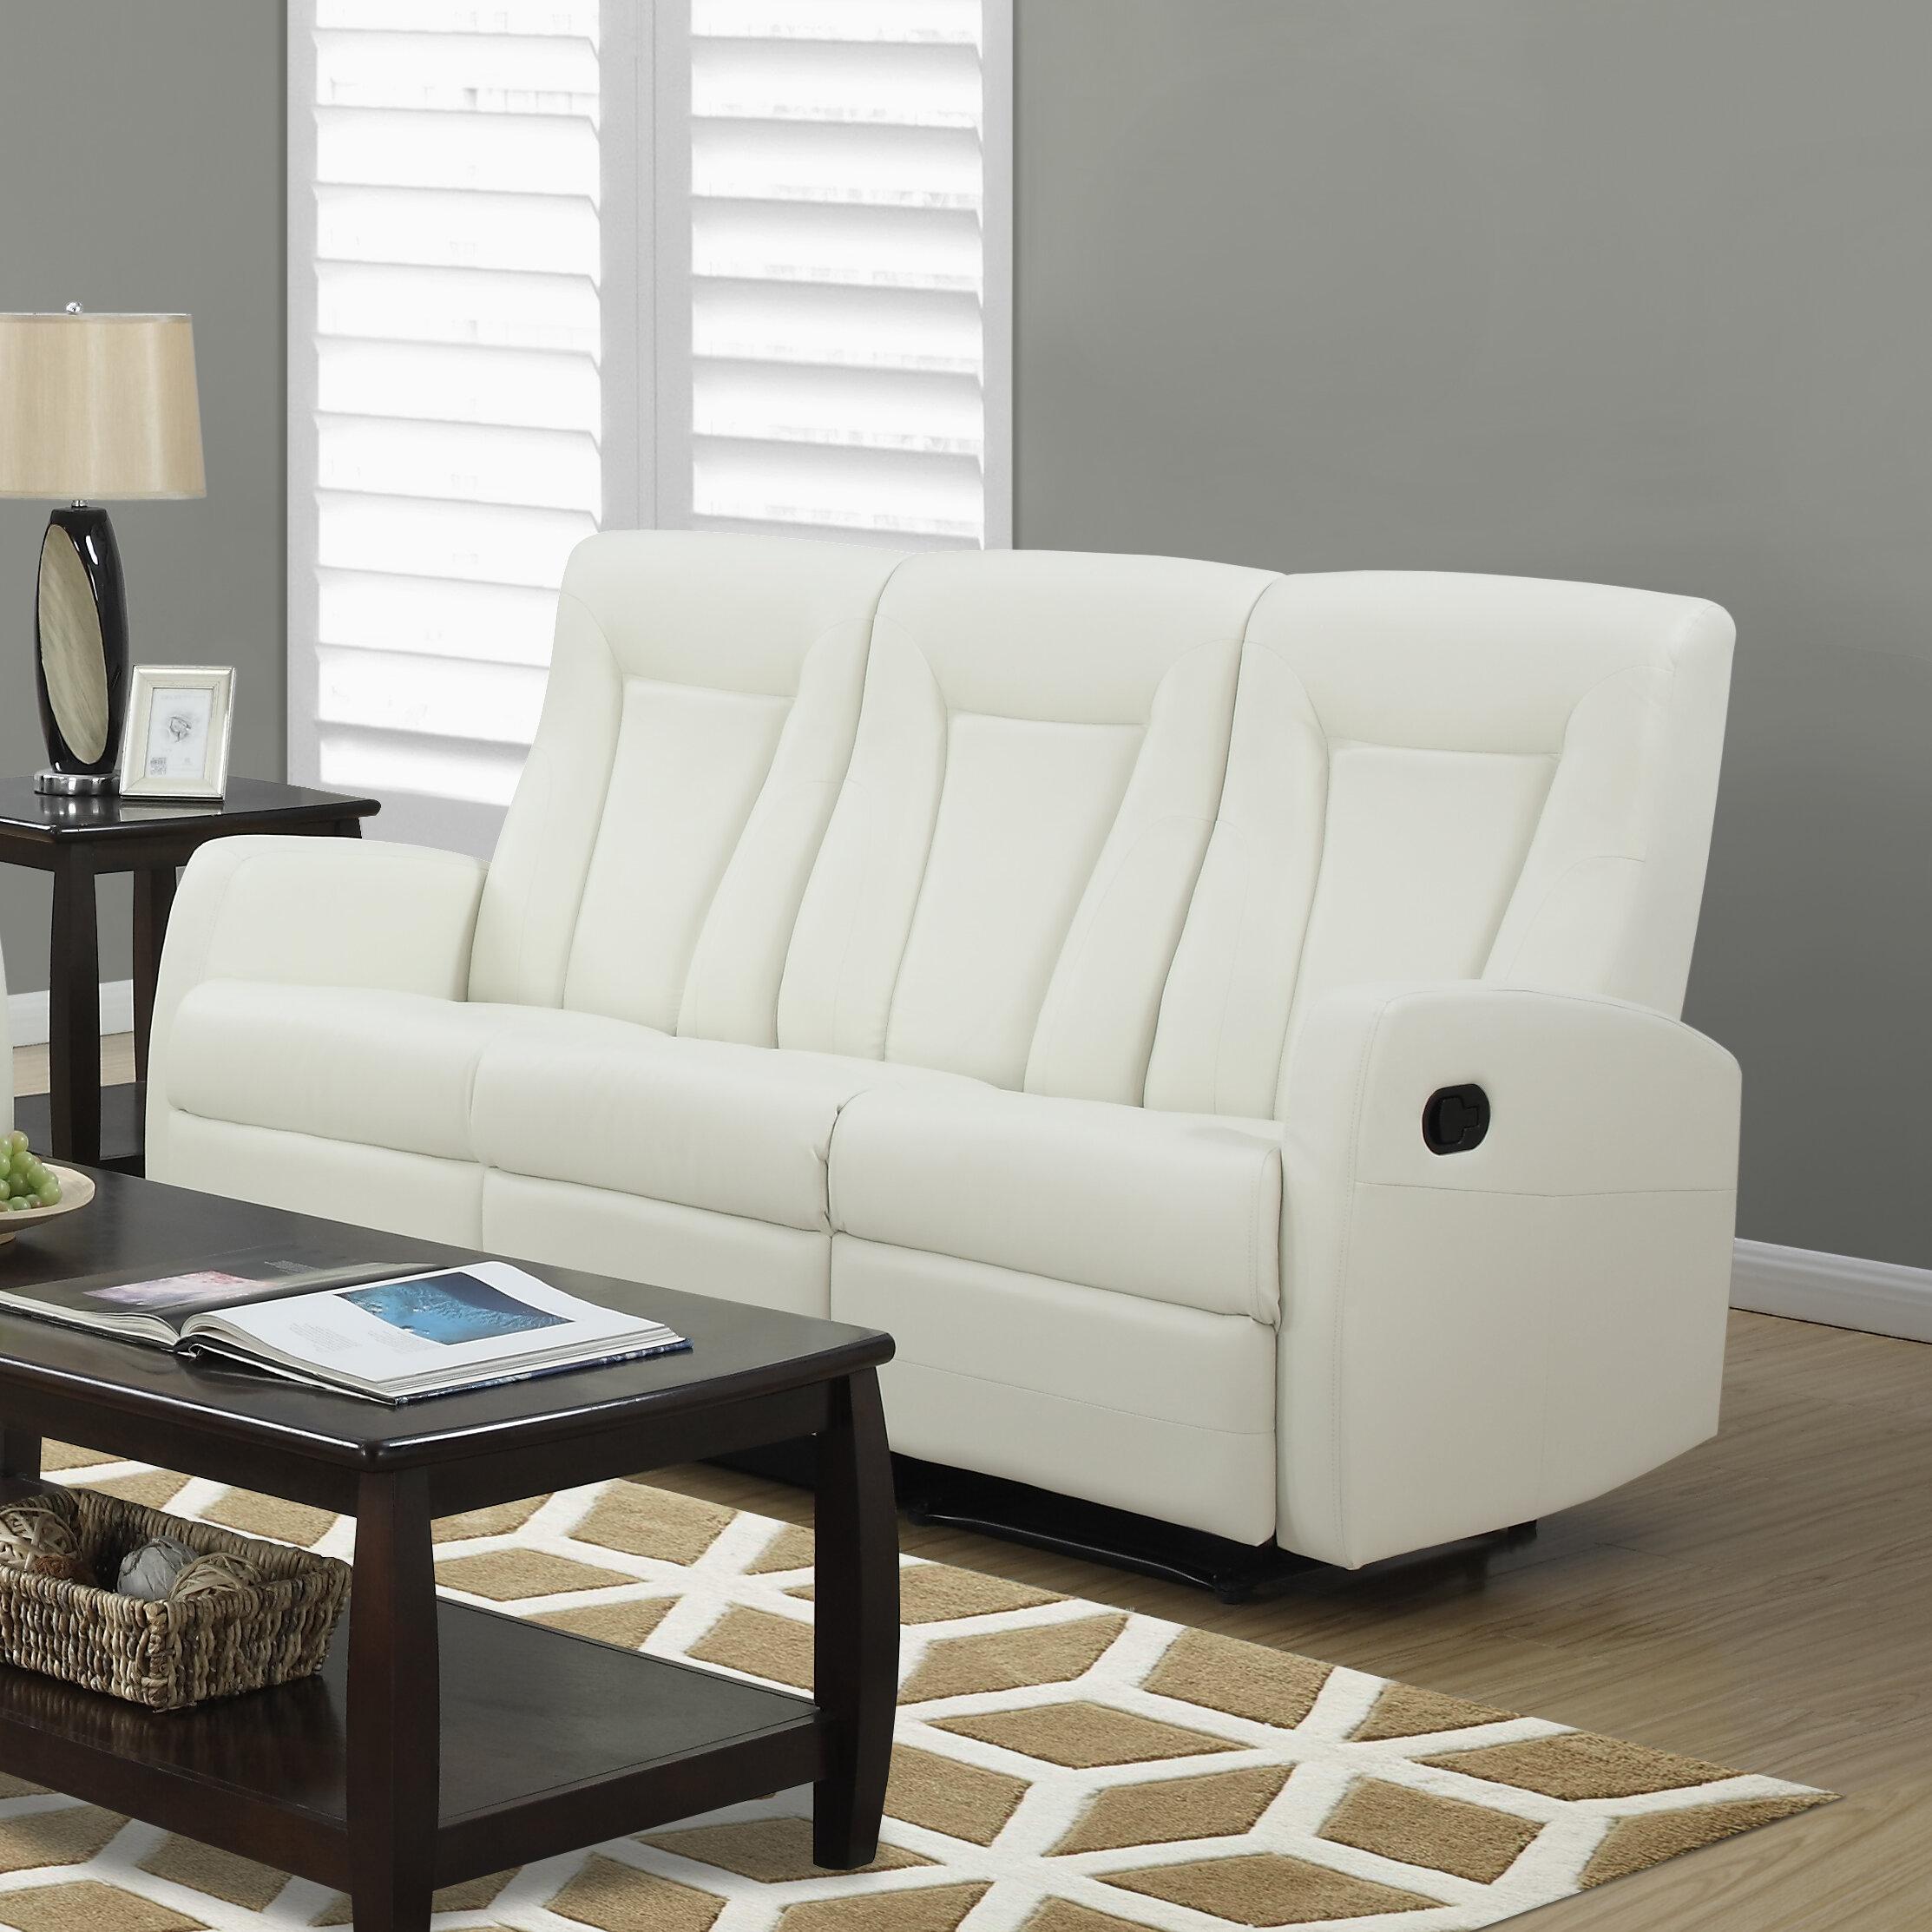 Monarch Specialties Inc. Bonded Leather Reclining Sofa U0026 Reviews | Wayfair